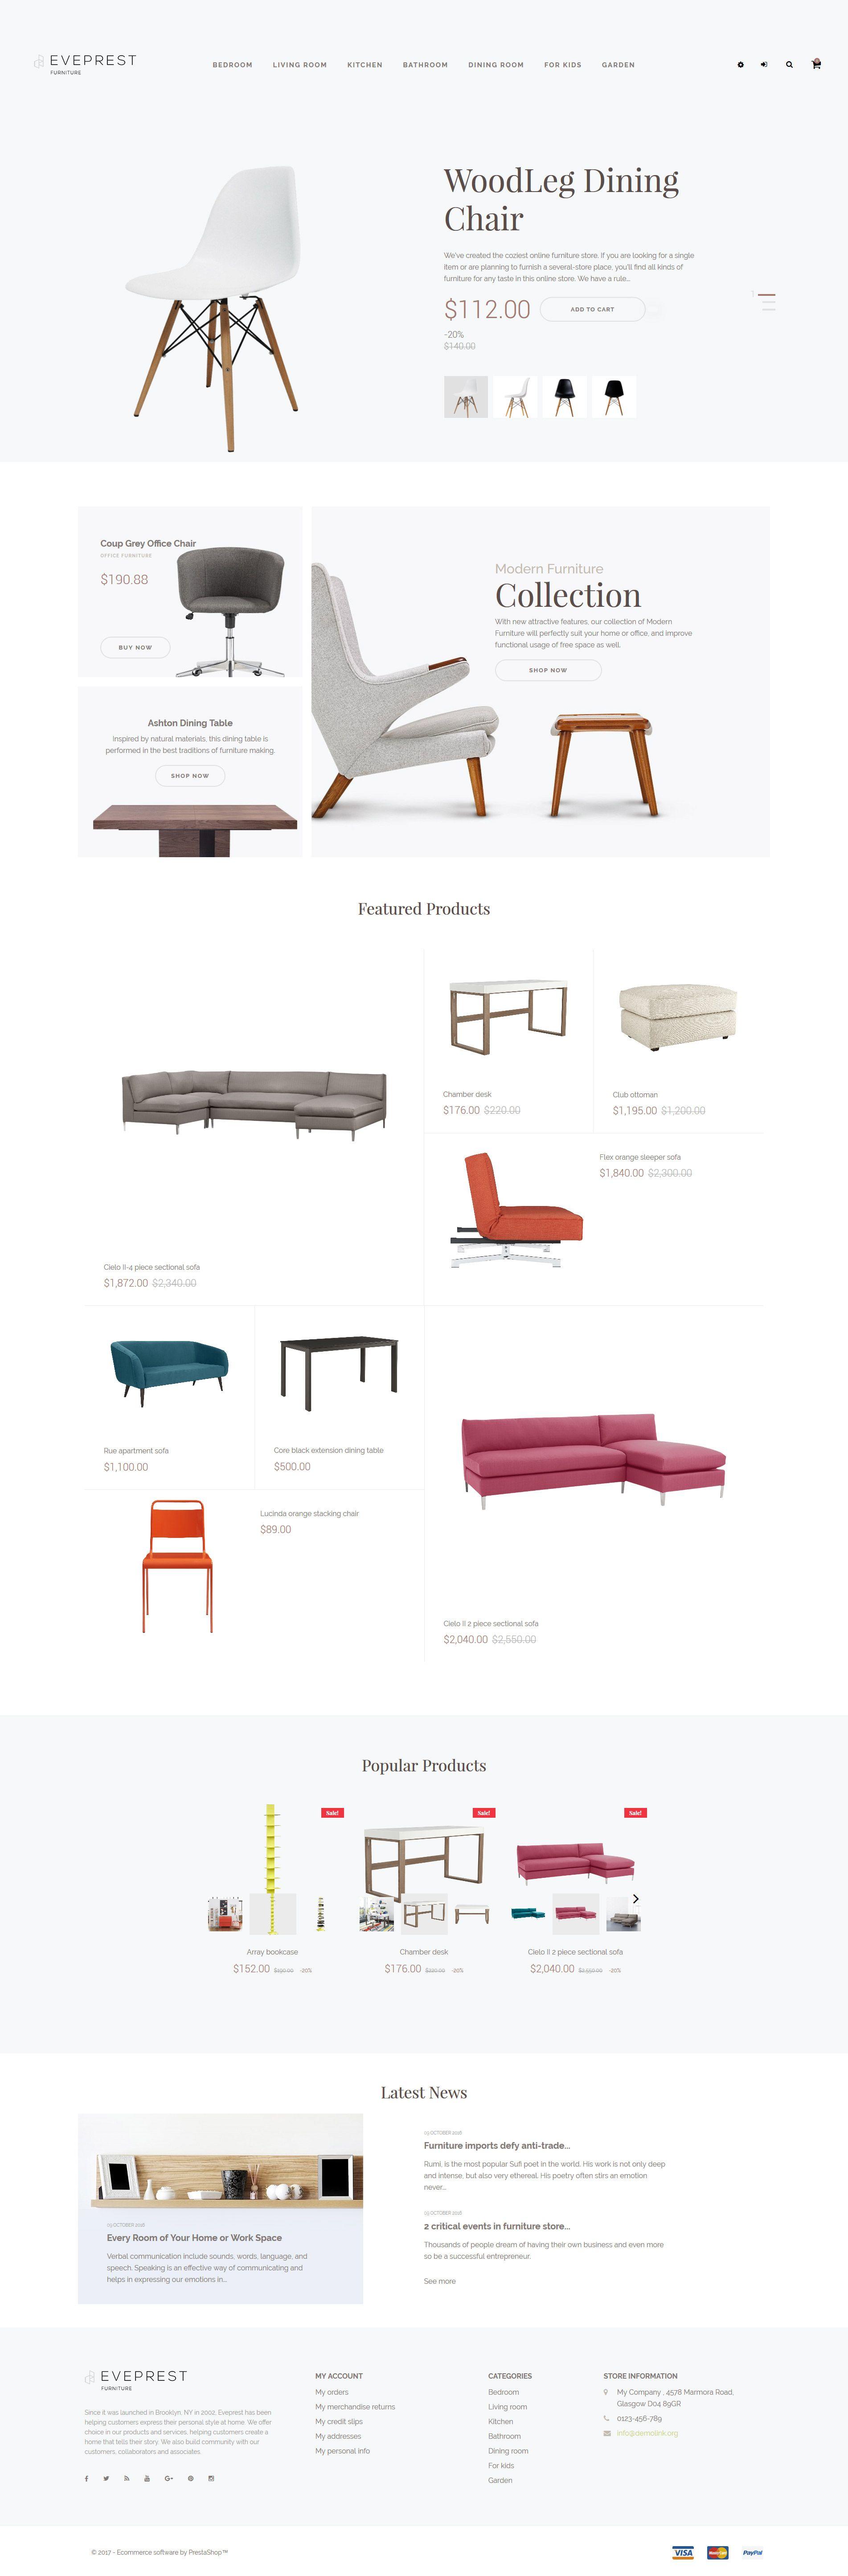 Eveprest Furniture Store PrestaShop Theme